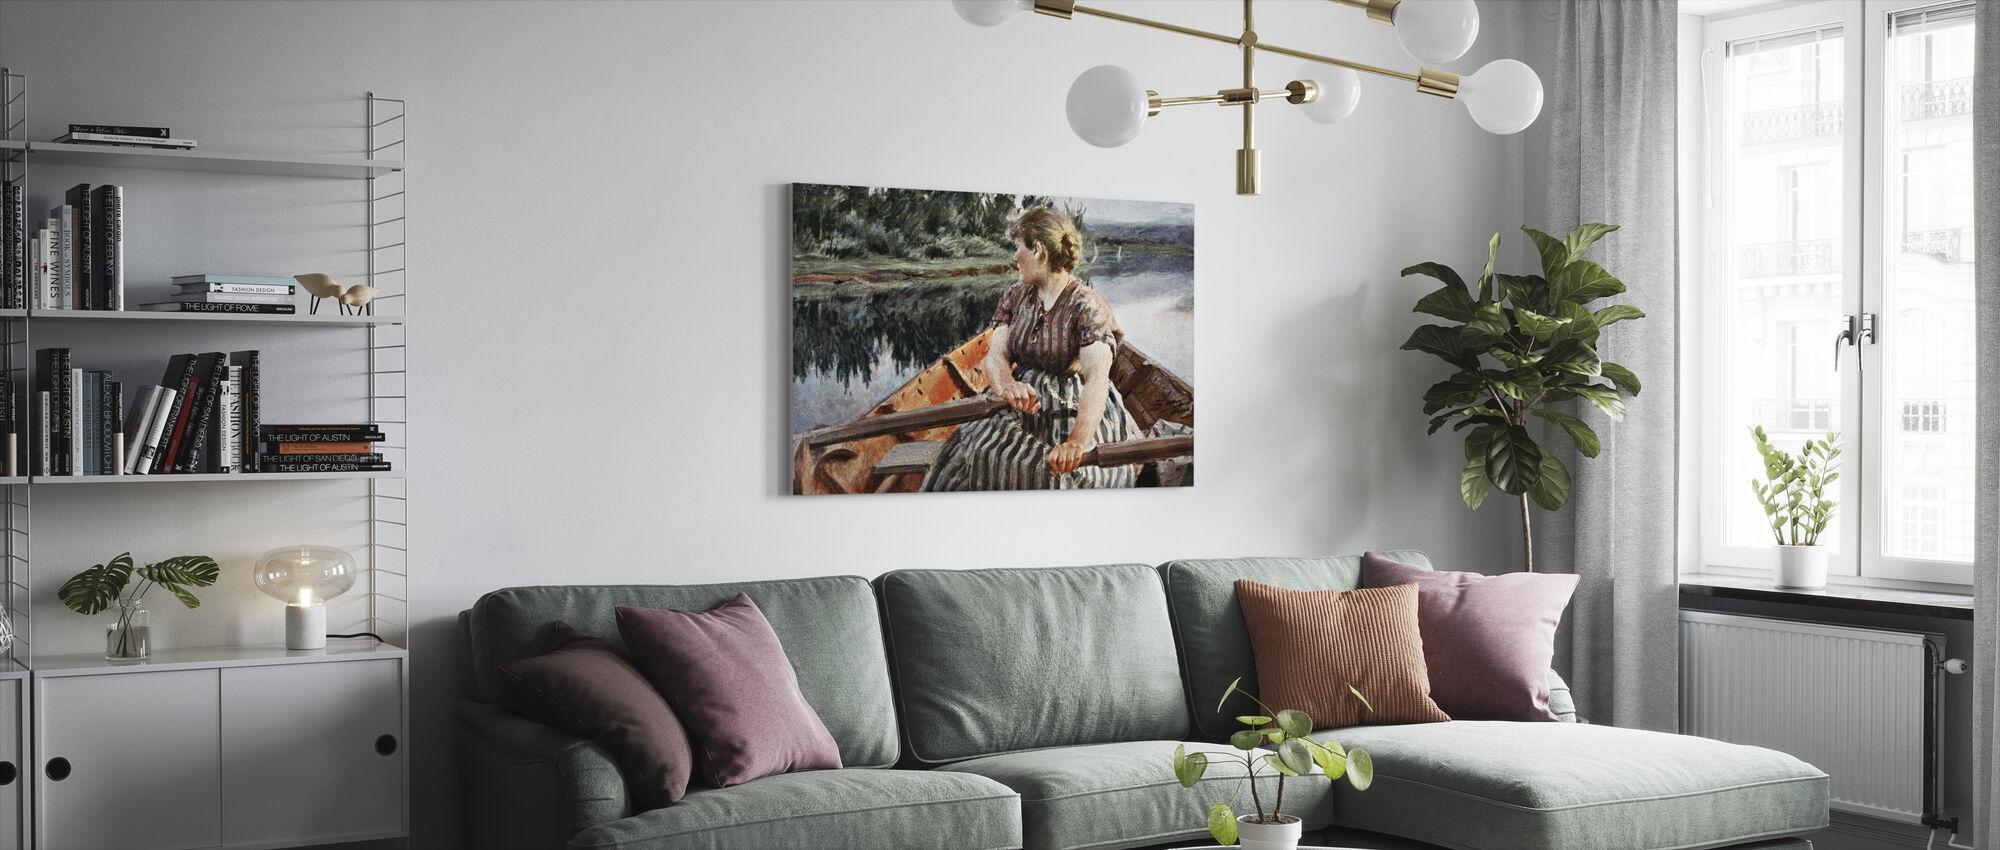 Midzomernacht, Anders Zorn - Canvas print - Woonkamer